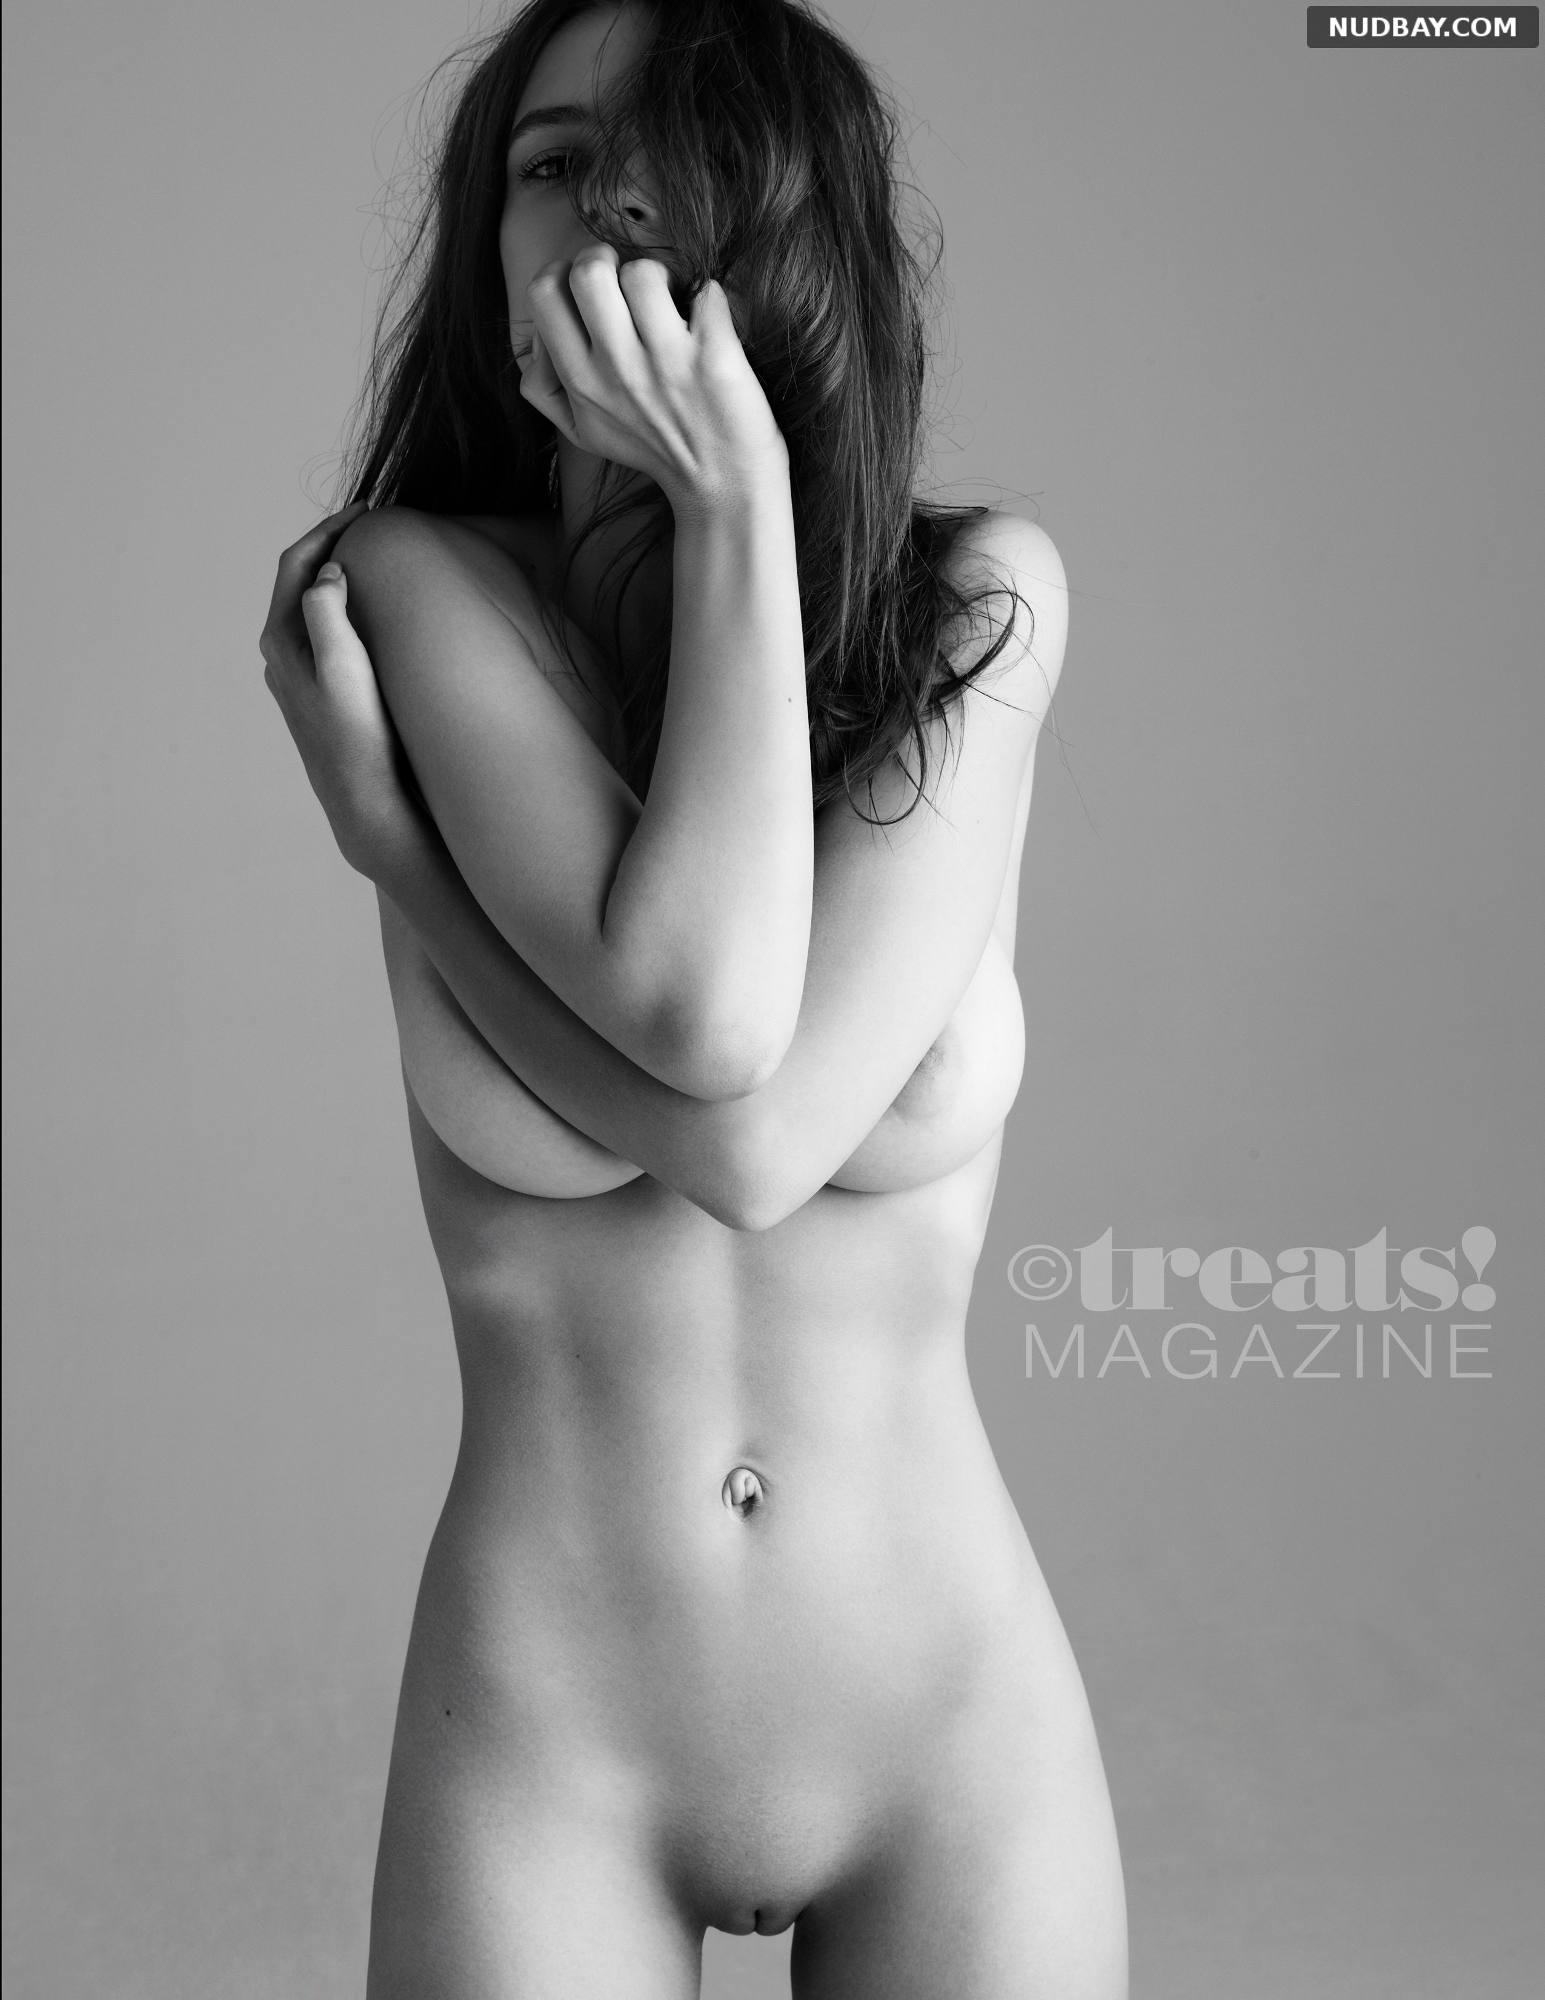 Emily Ratajkowski nude photoshoot Treats Magazine 2021